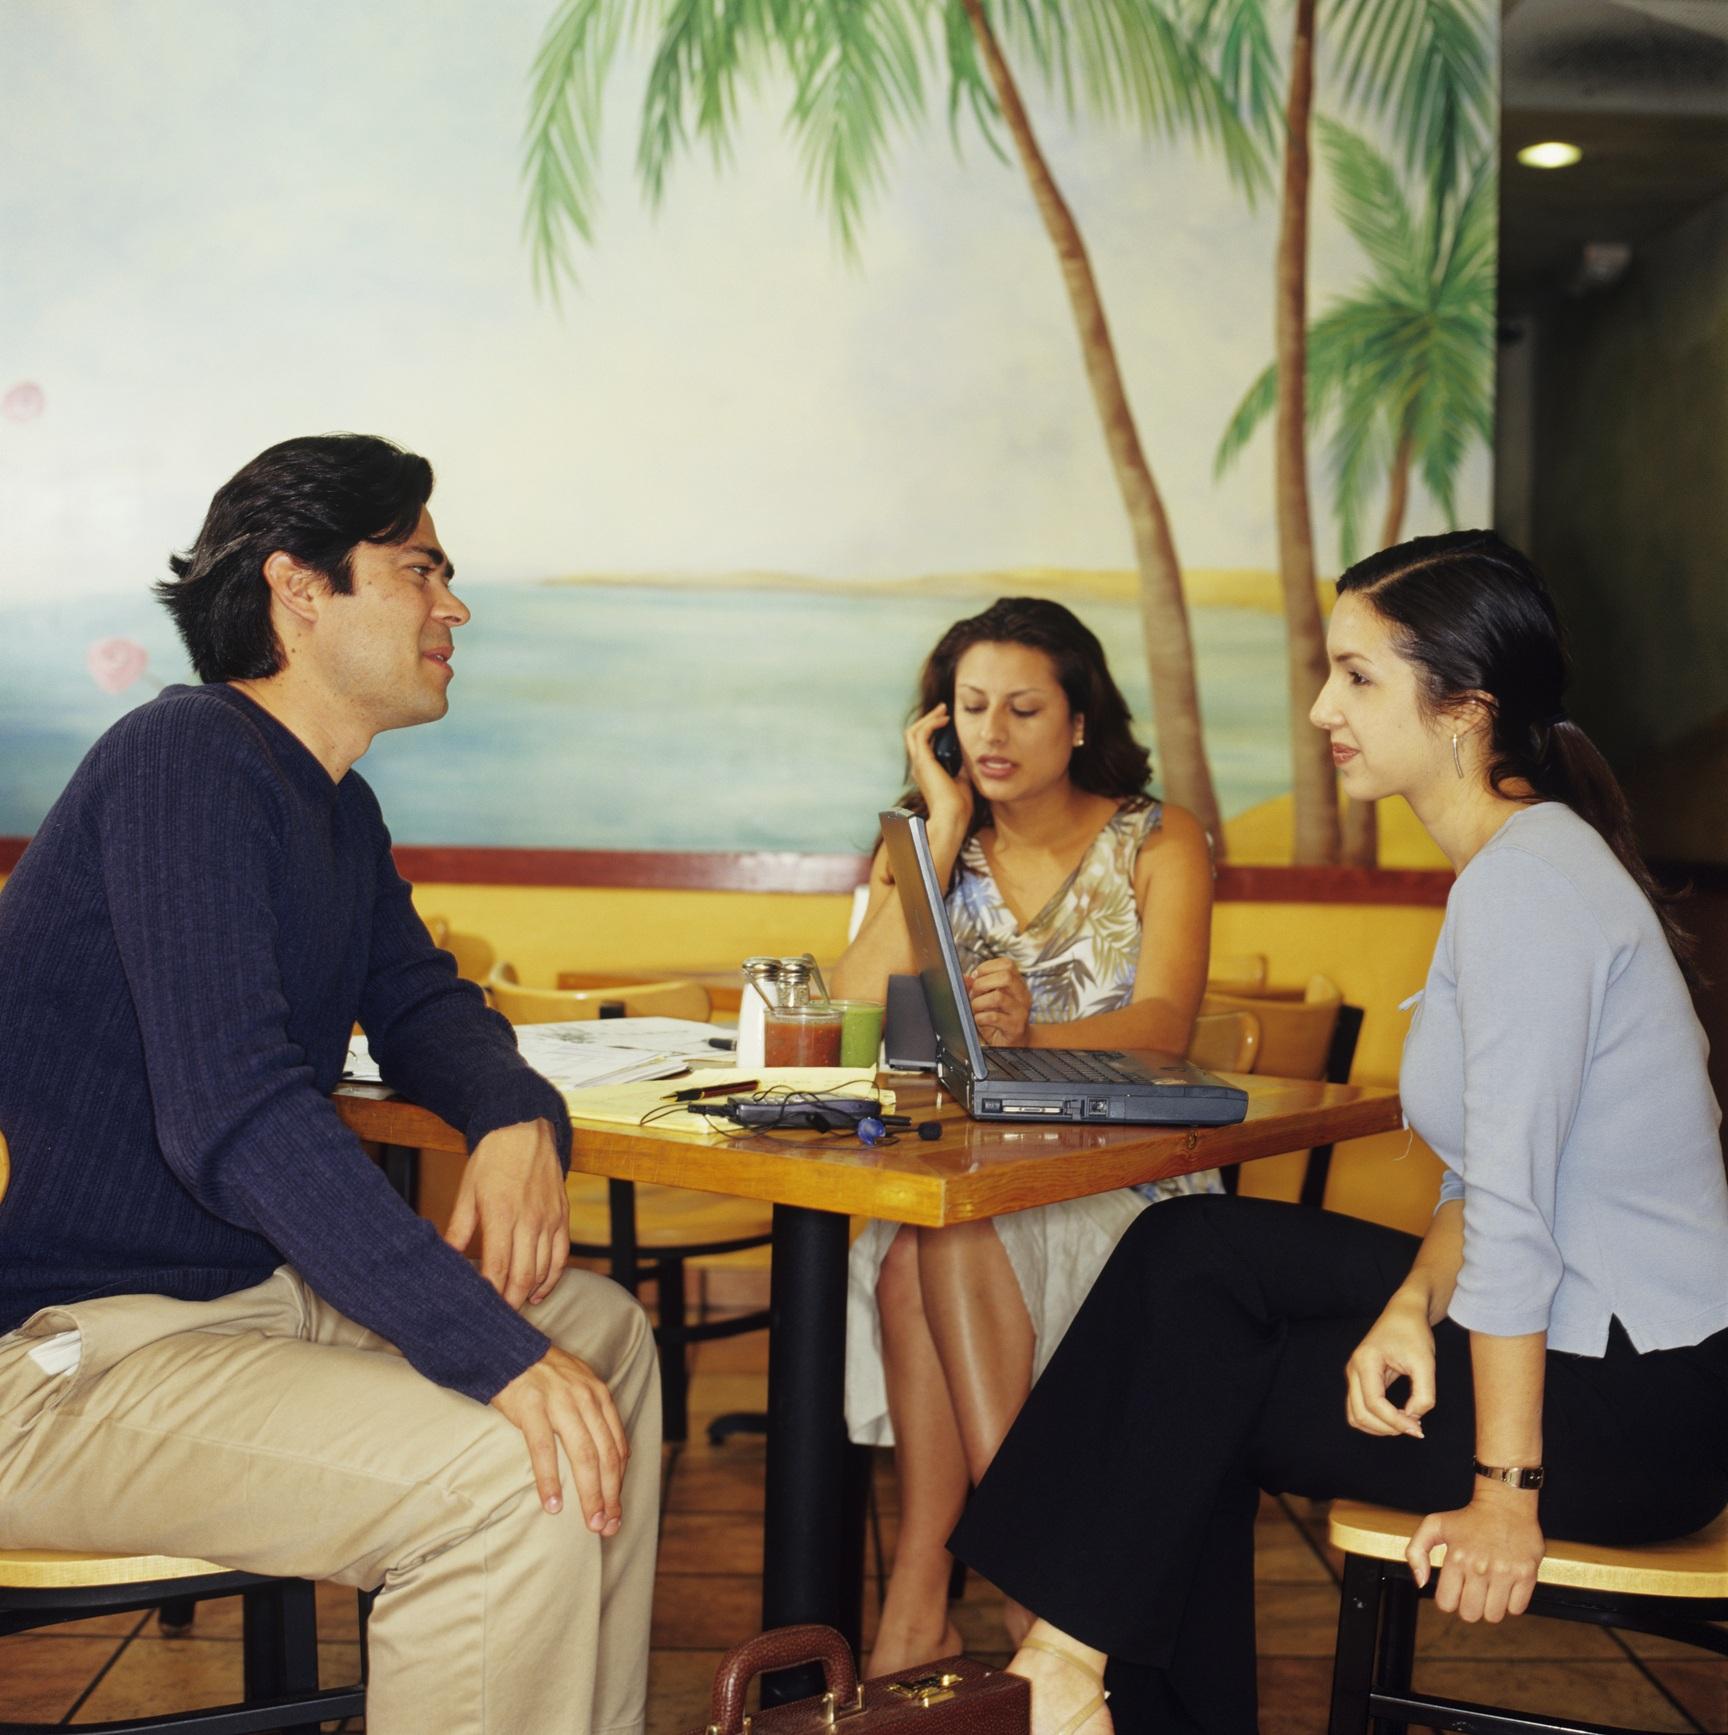 Three entrepreneurs dining at Mexican restaurant